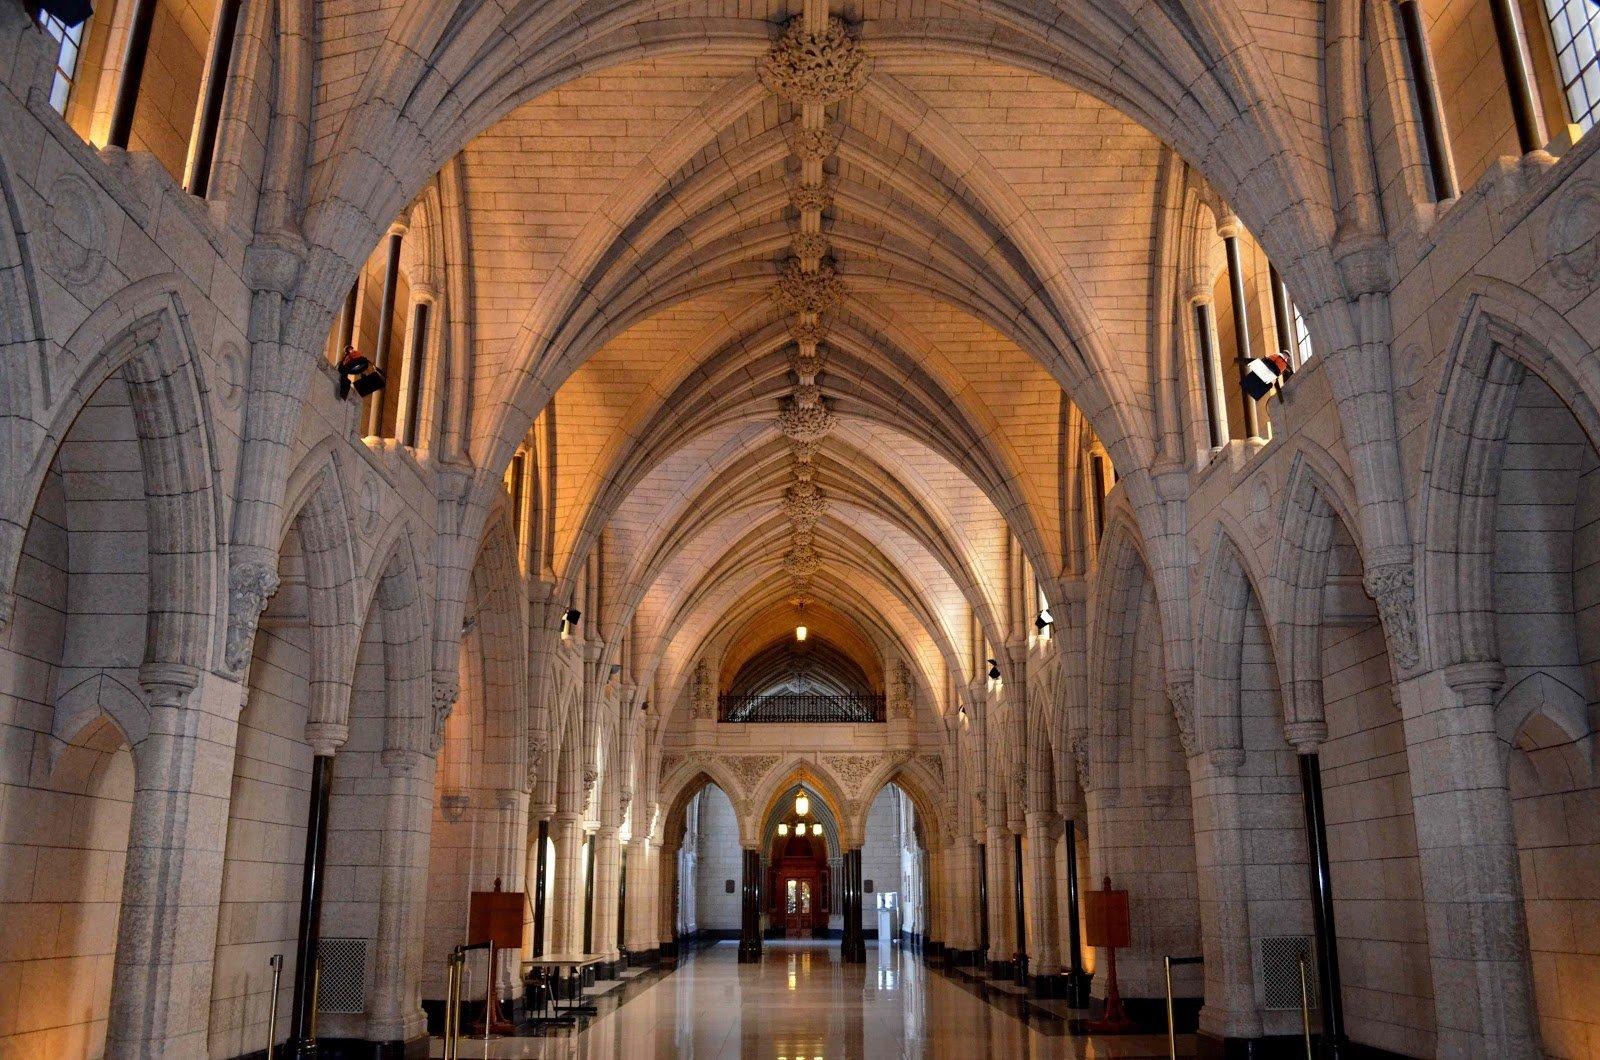 Parliament Hall